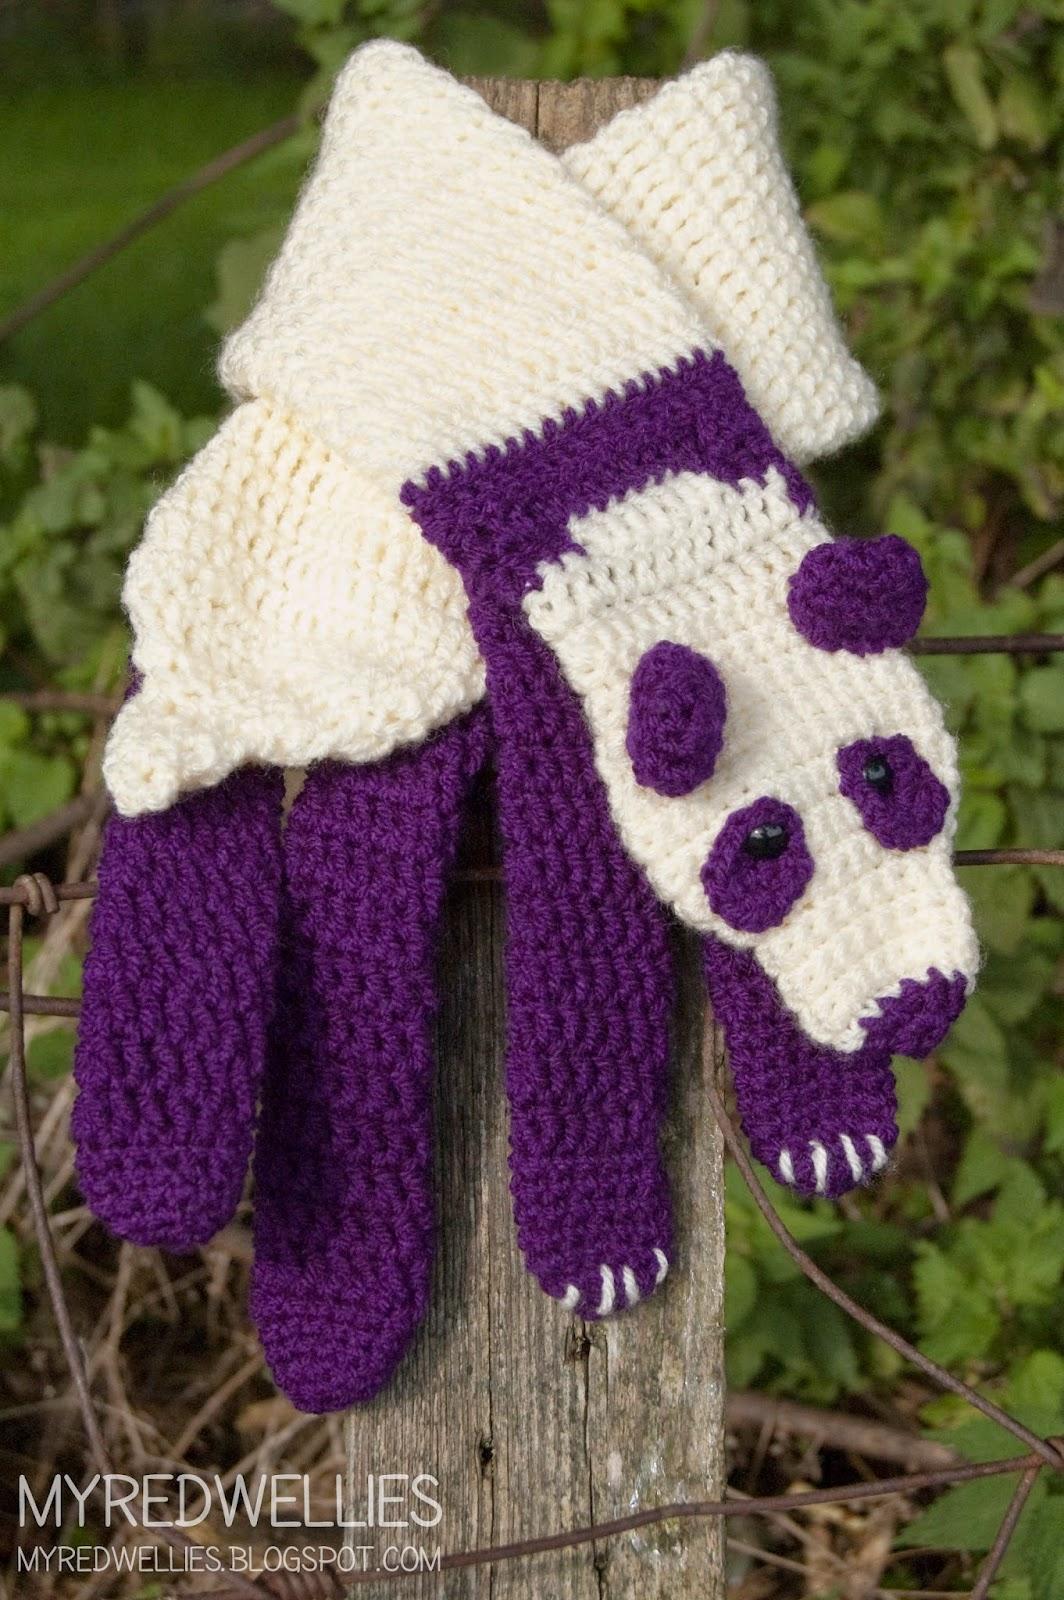 My Red Wellies: Purple Panda Scarf, a start on christmas.